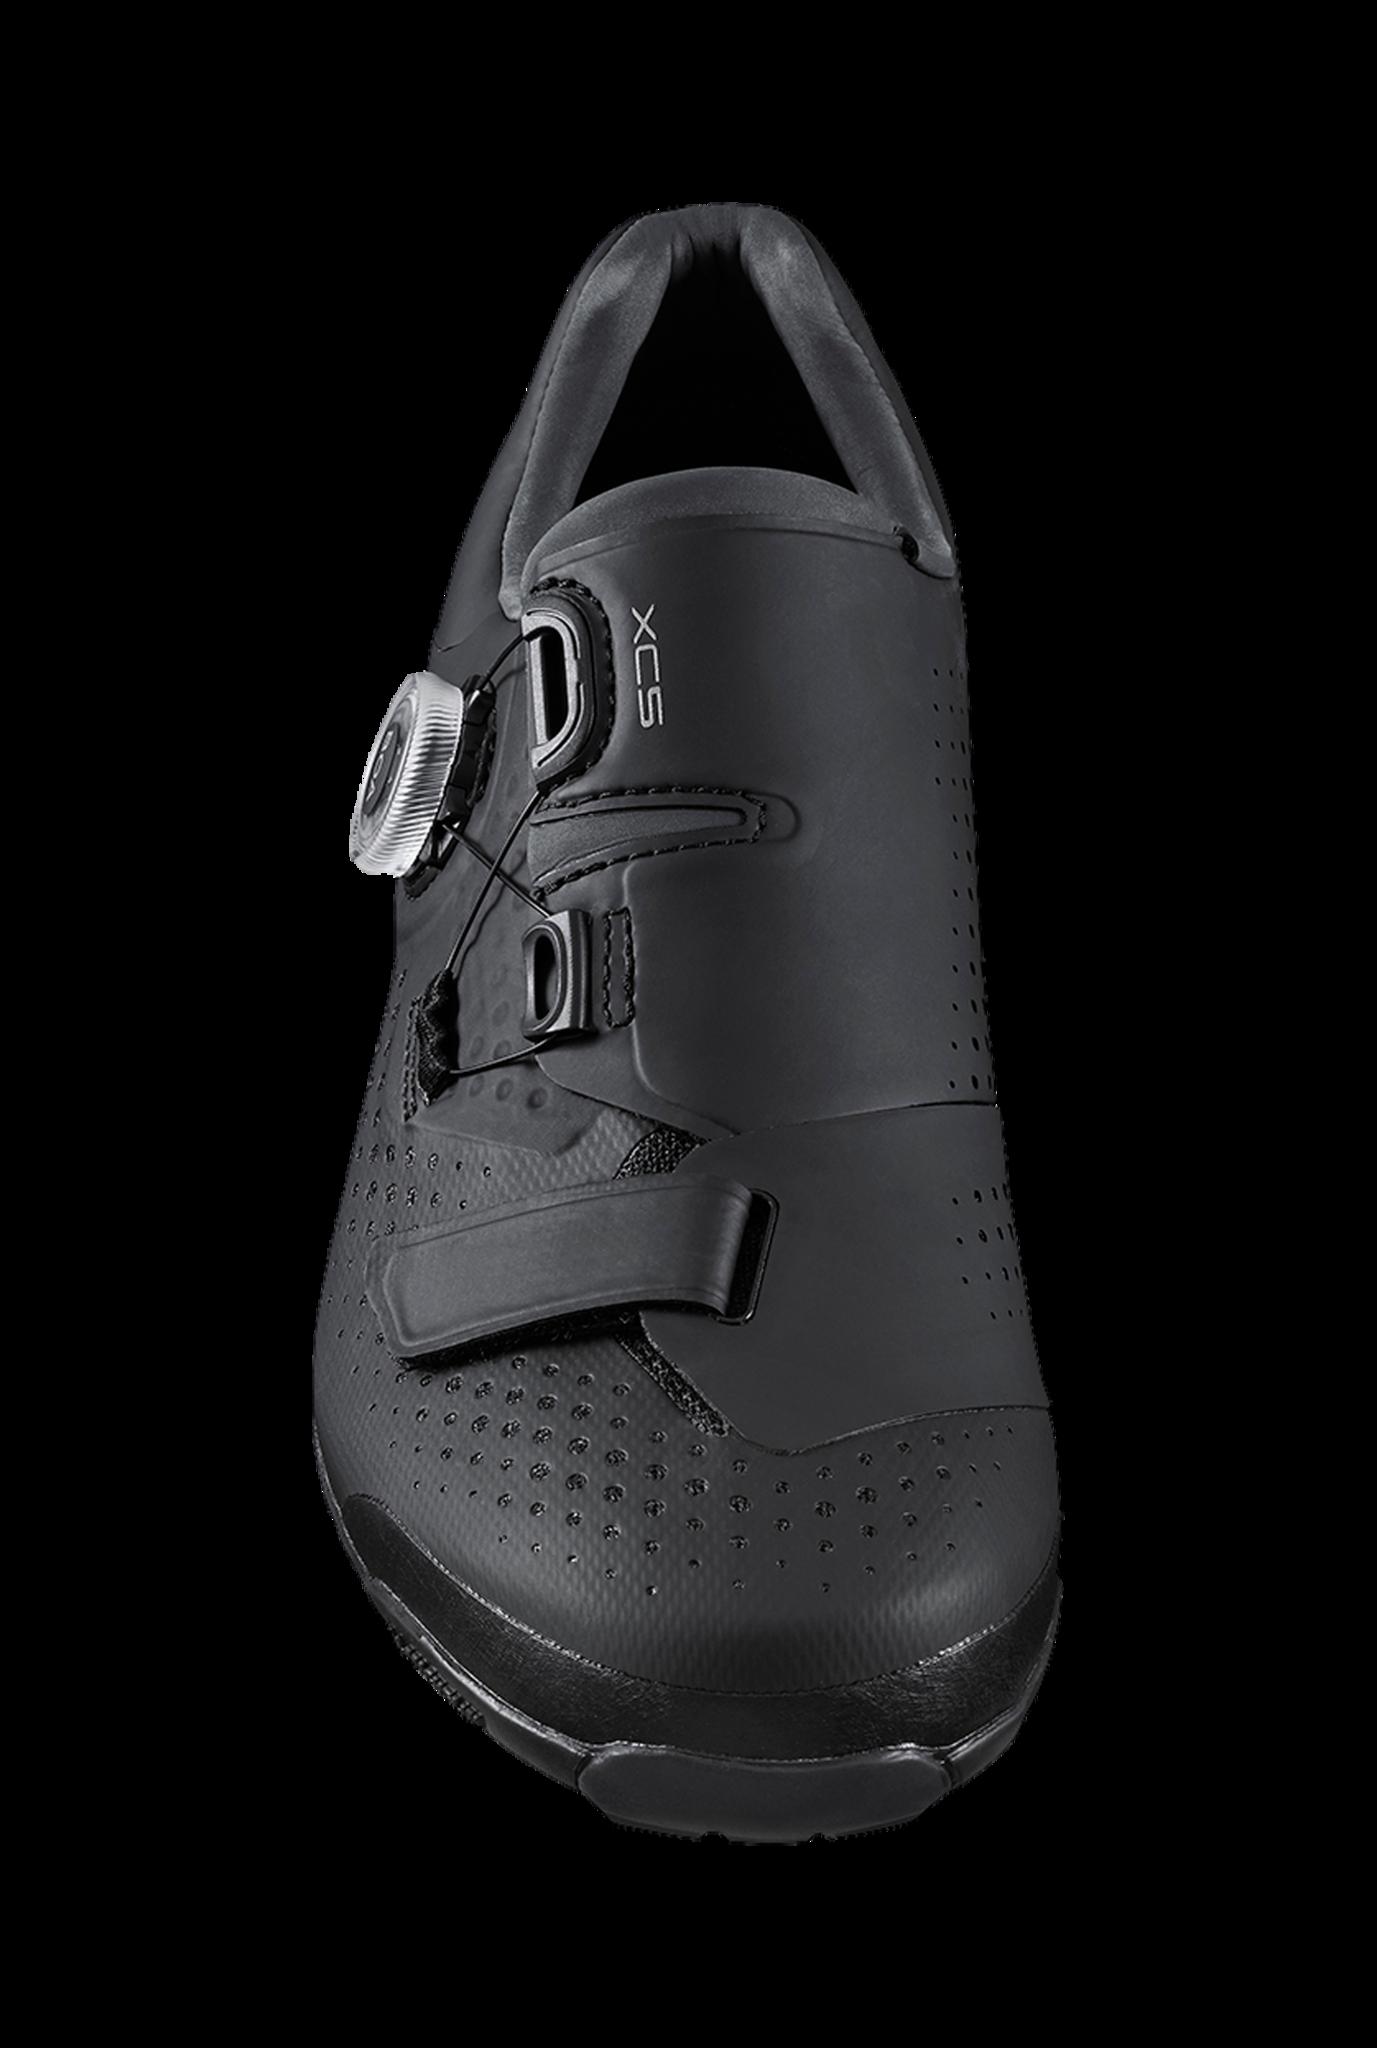 Schoenen XC501 Zwart-2